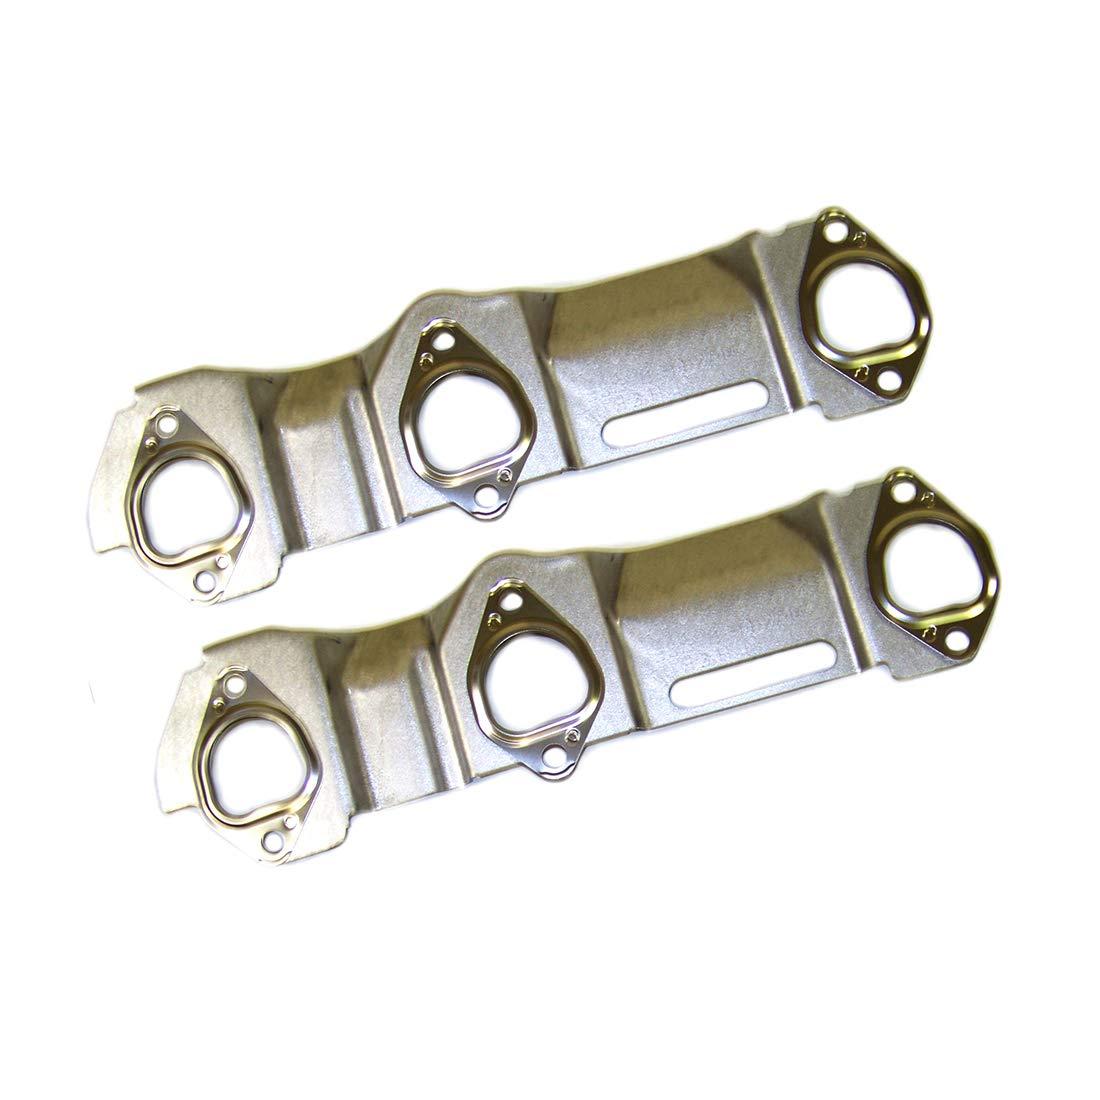 DNJ EG3135 Exhaust Manifold Gasket